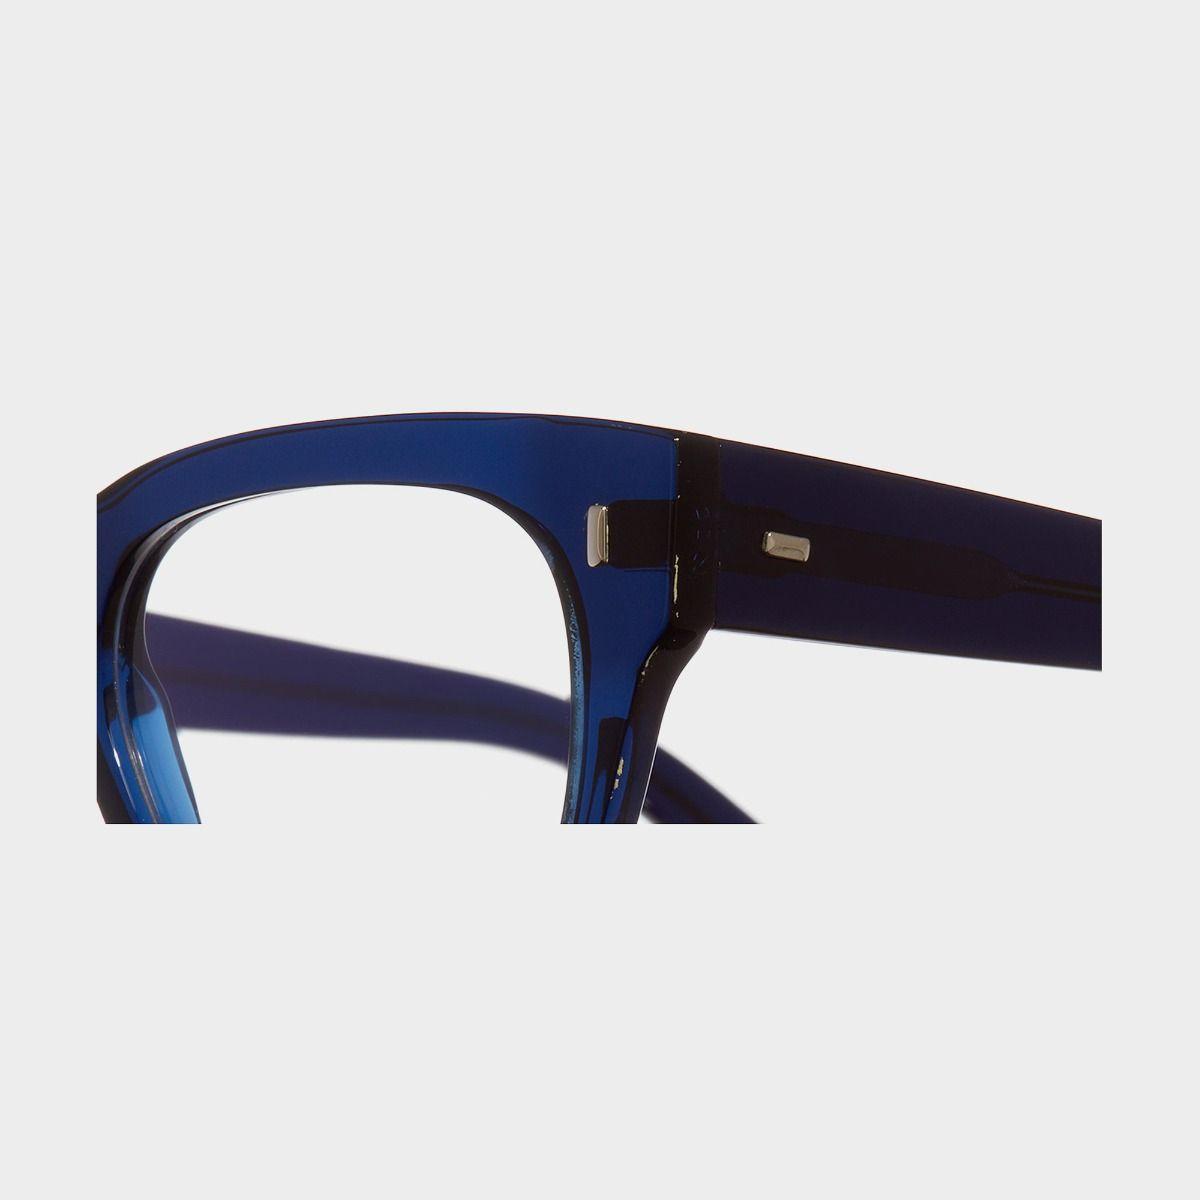 0772V2 Optical Square Glasses-Classic Navy Blue